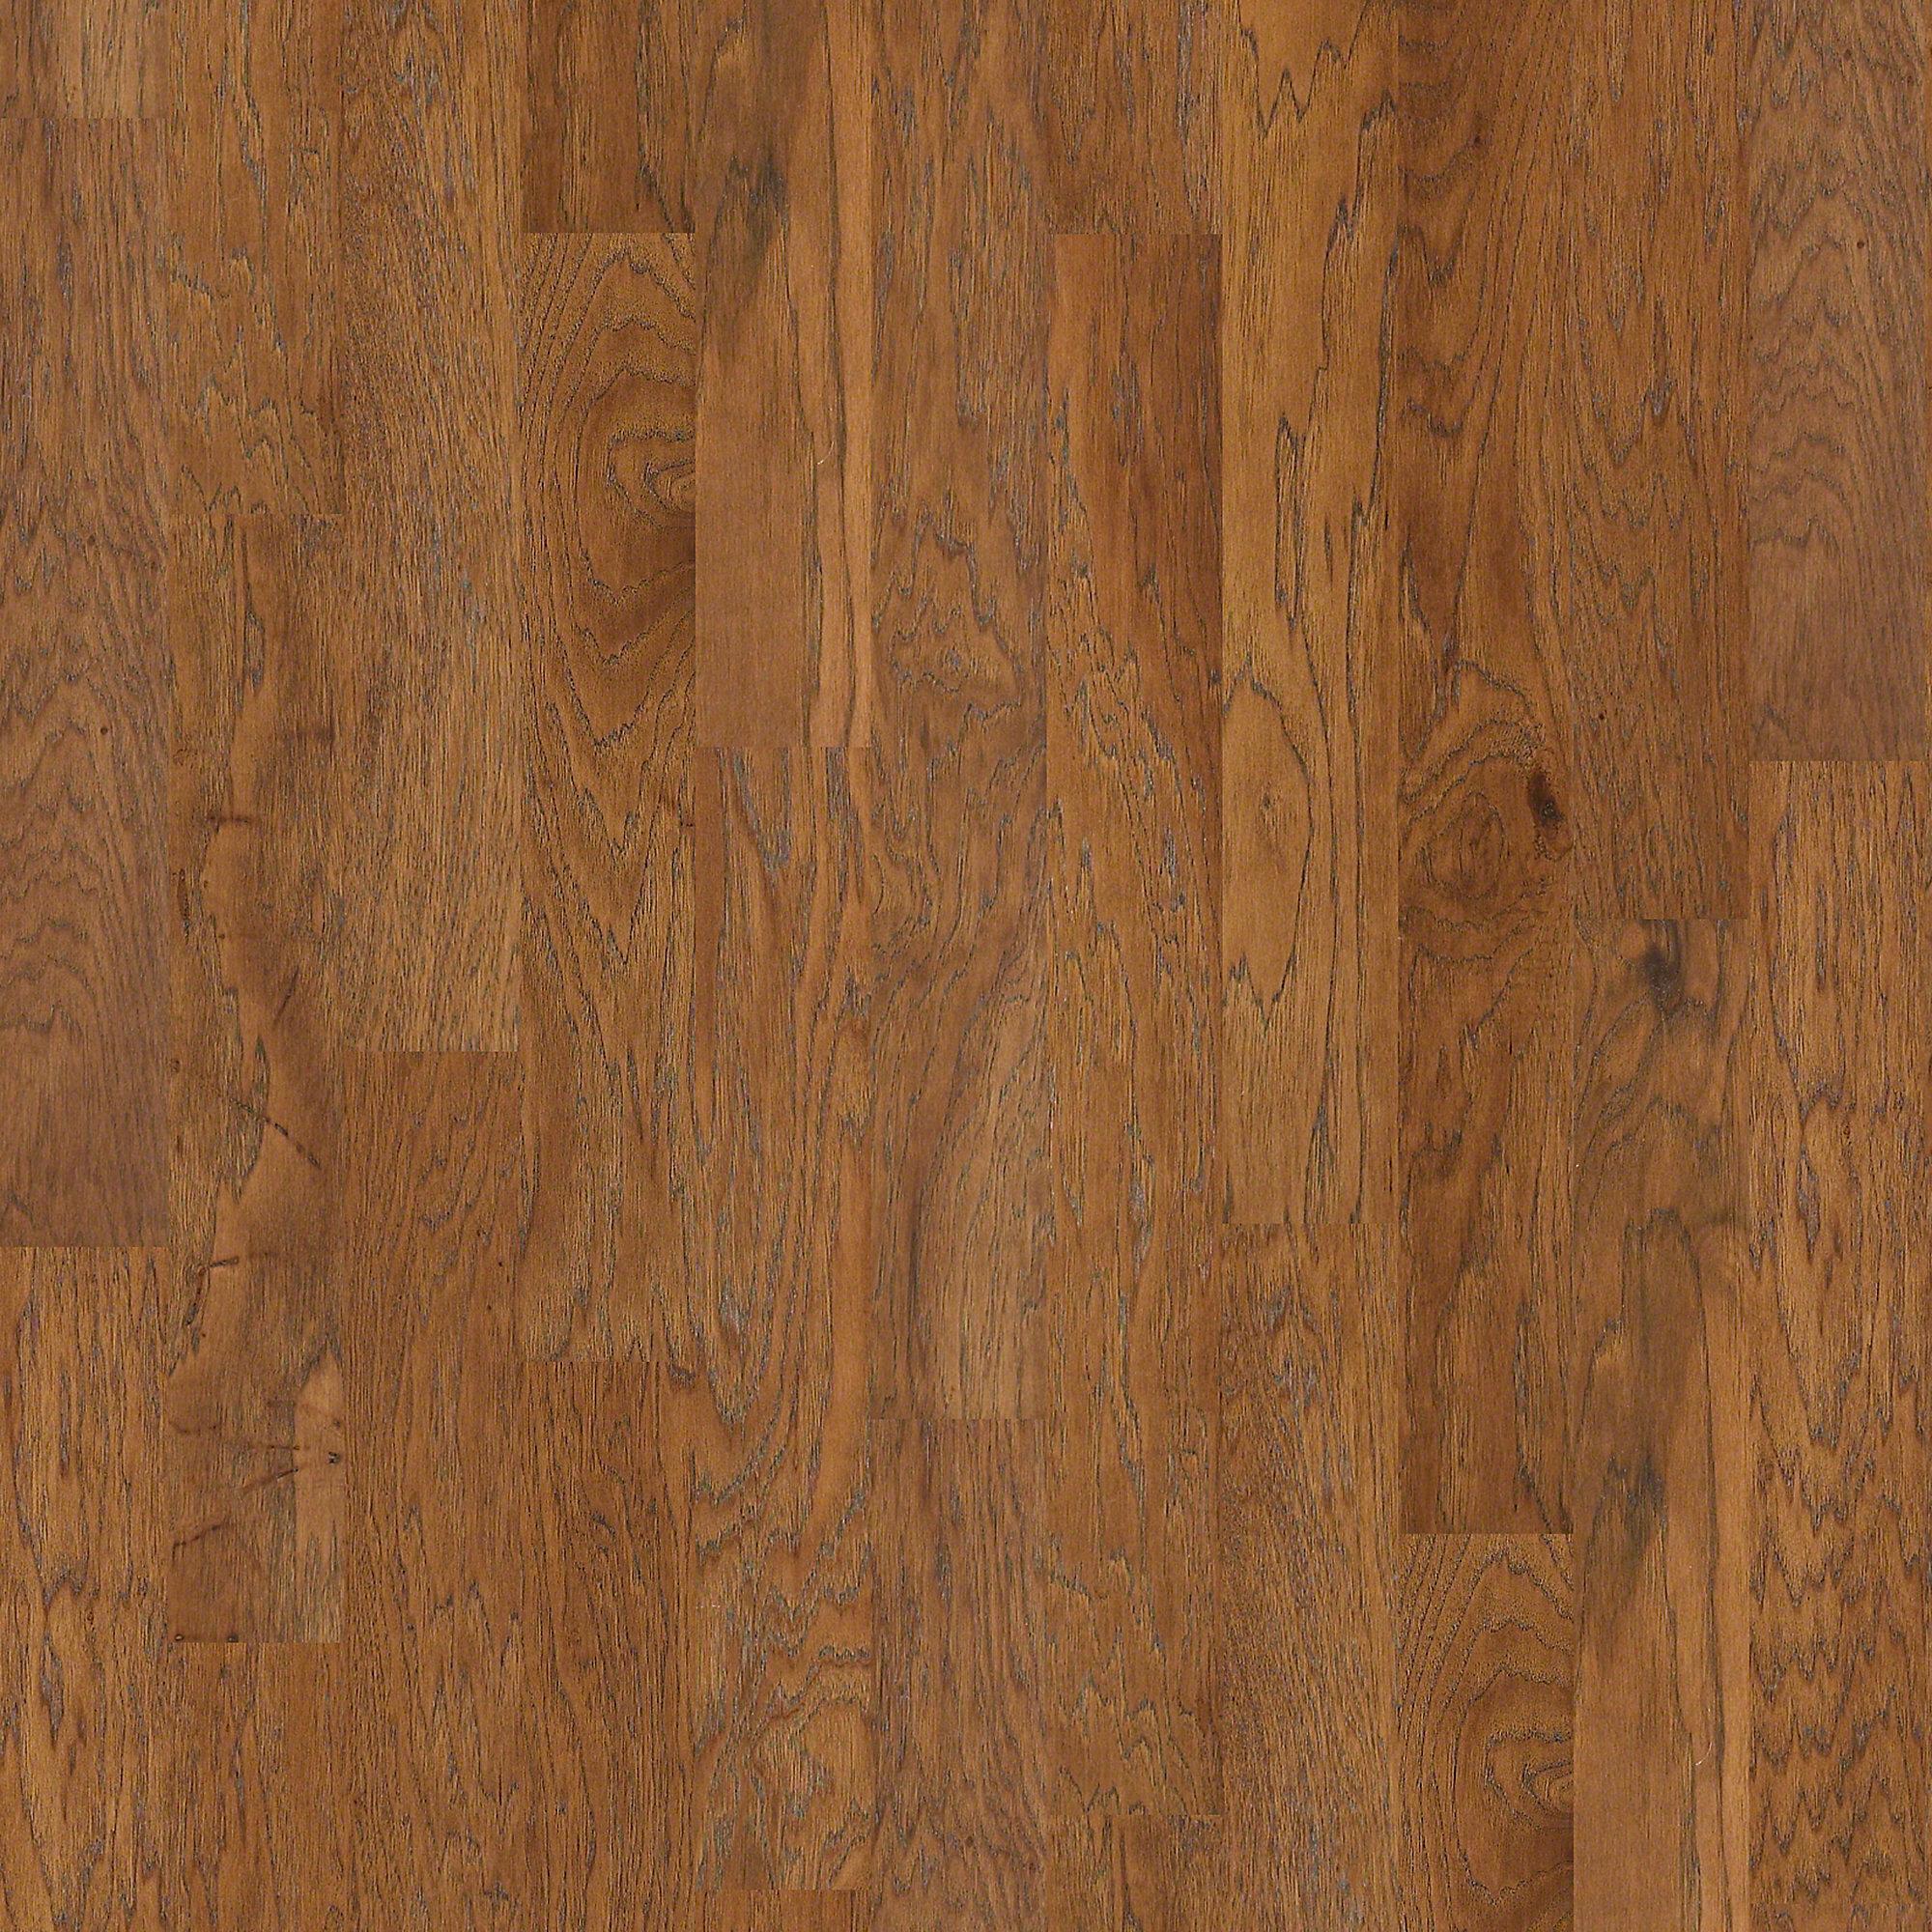 Shaw Floors Victorian Hickory 4.8\